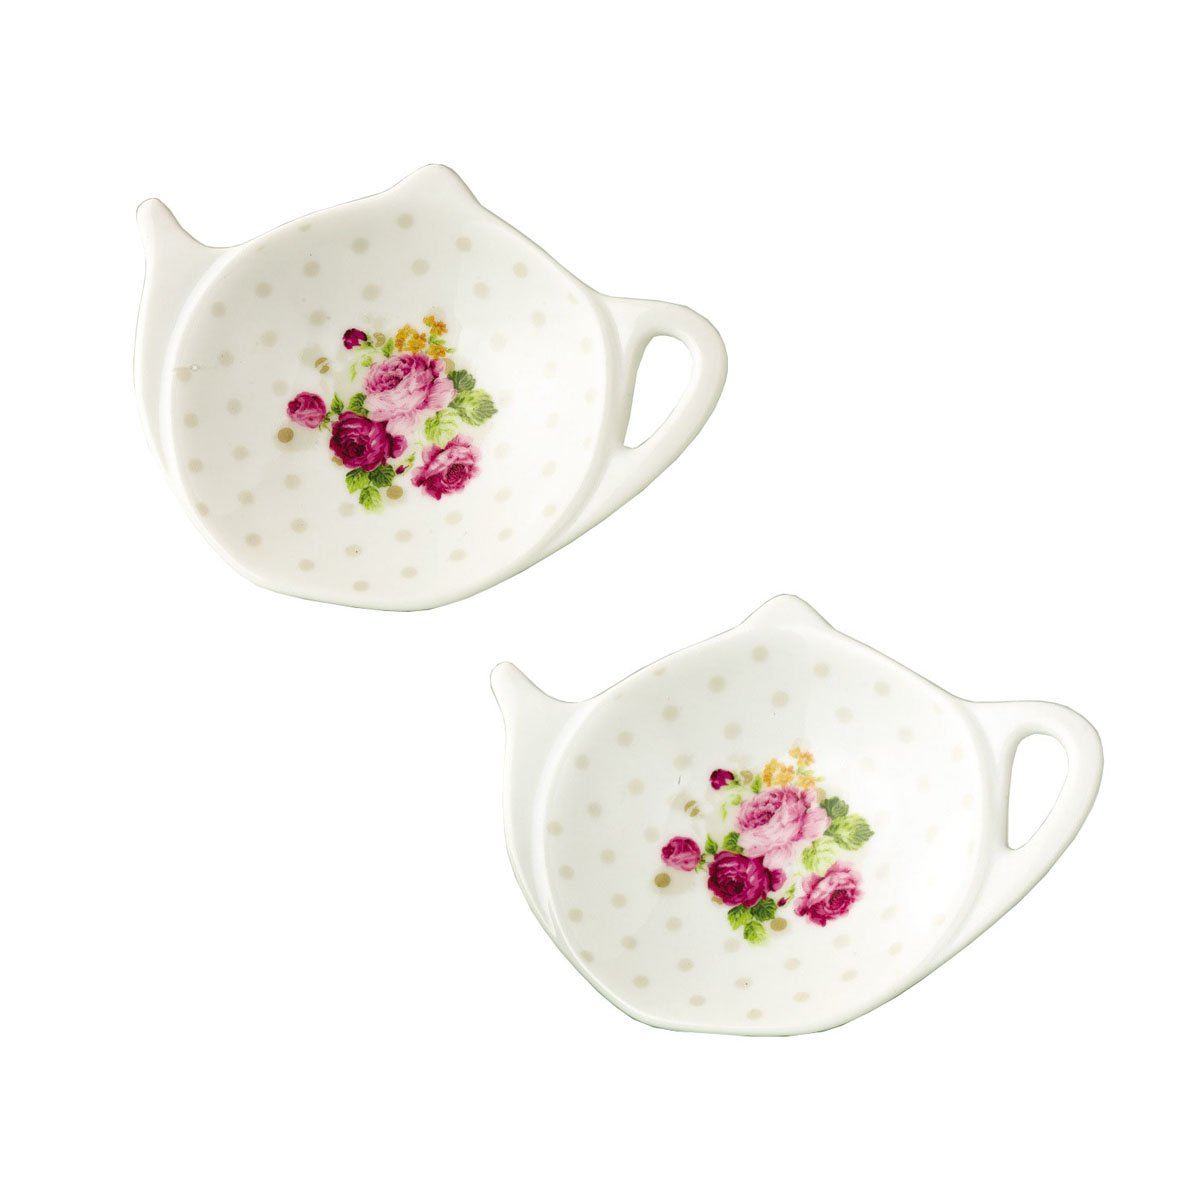 RockTrend Vintage Rose White Porcelain Ceramic Teapot-Shaped Tea Bag Holder Tea Bag Coasters, Spoon Rests; Classic Tea Saucer Seasoning Dish with Flower Trim Gold Rim (Flower C, 2 PCS)